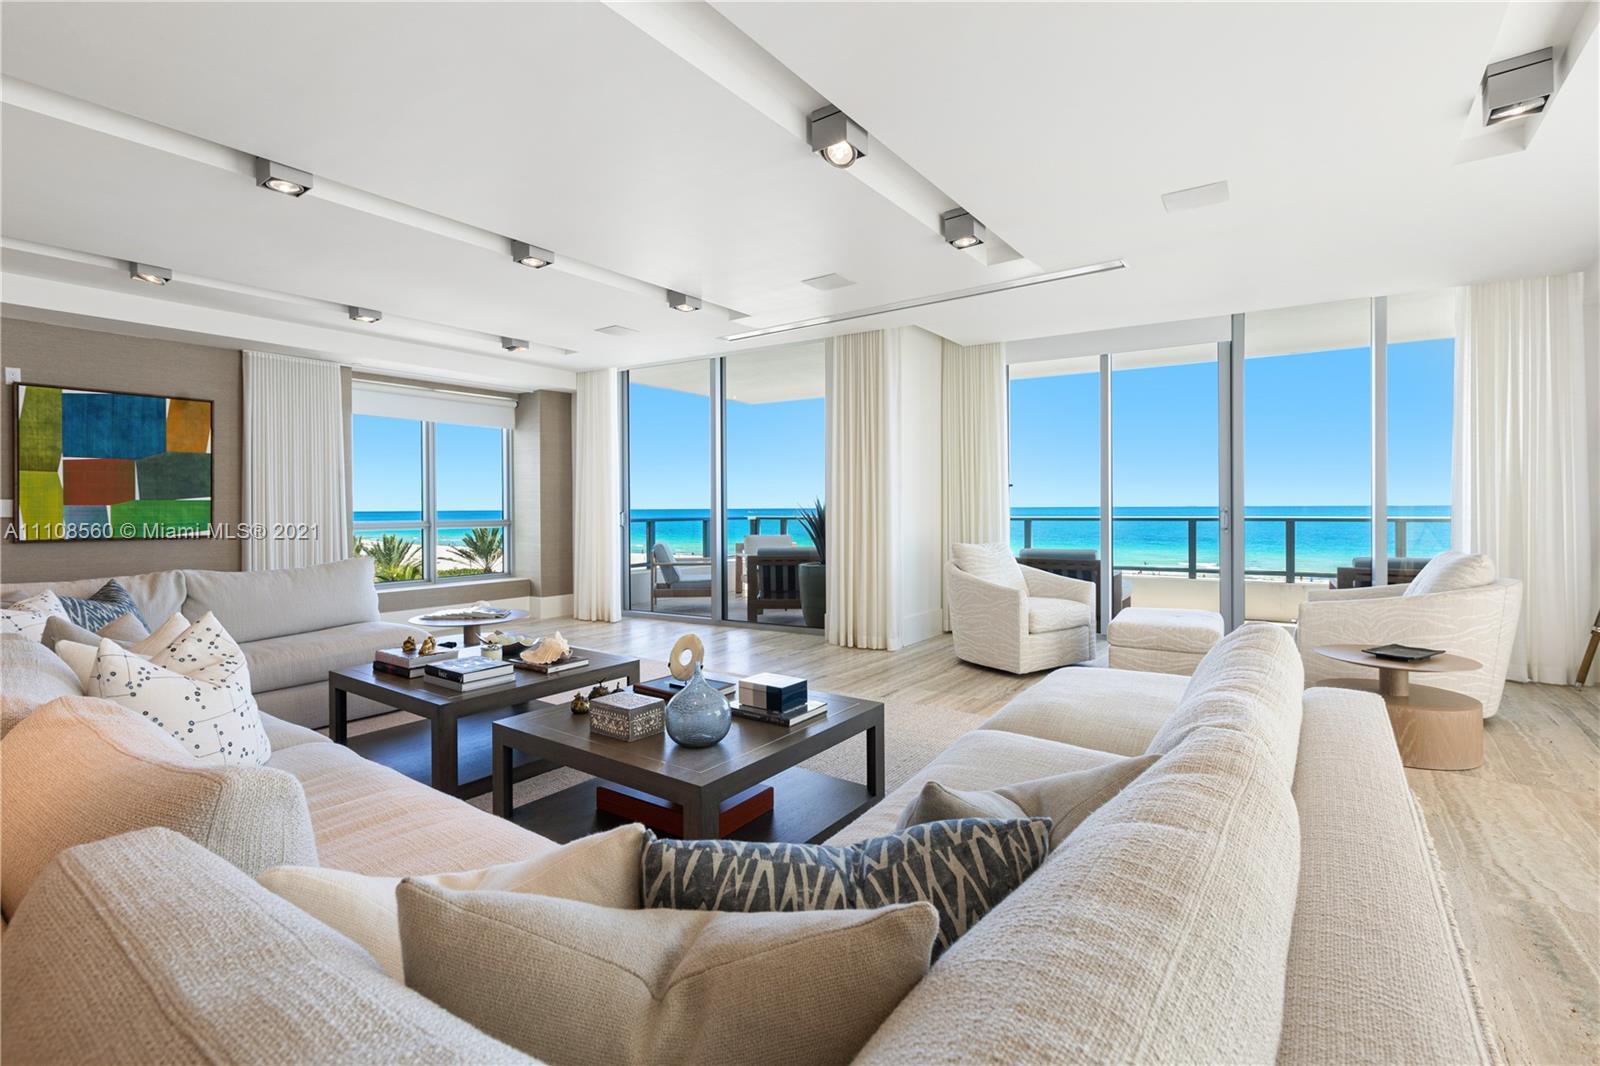 OCEAN HOUSE CONDO Condo,For Sale,OCEAN HOUSE CONDO Brickell,realty,broker,condos near me